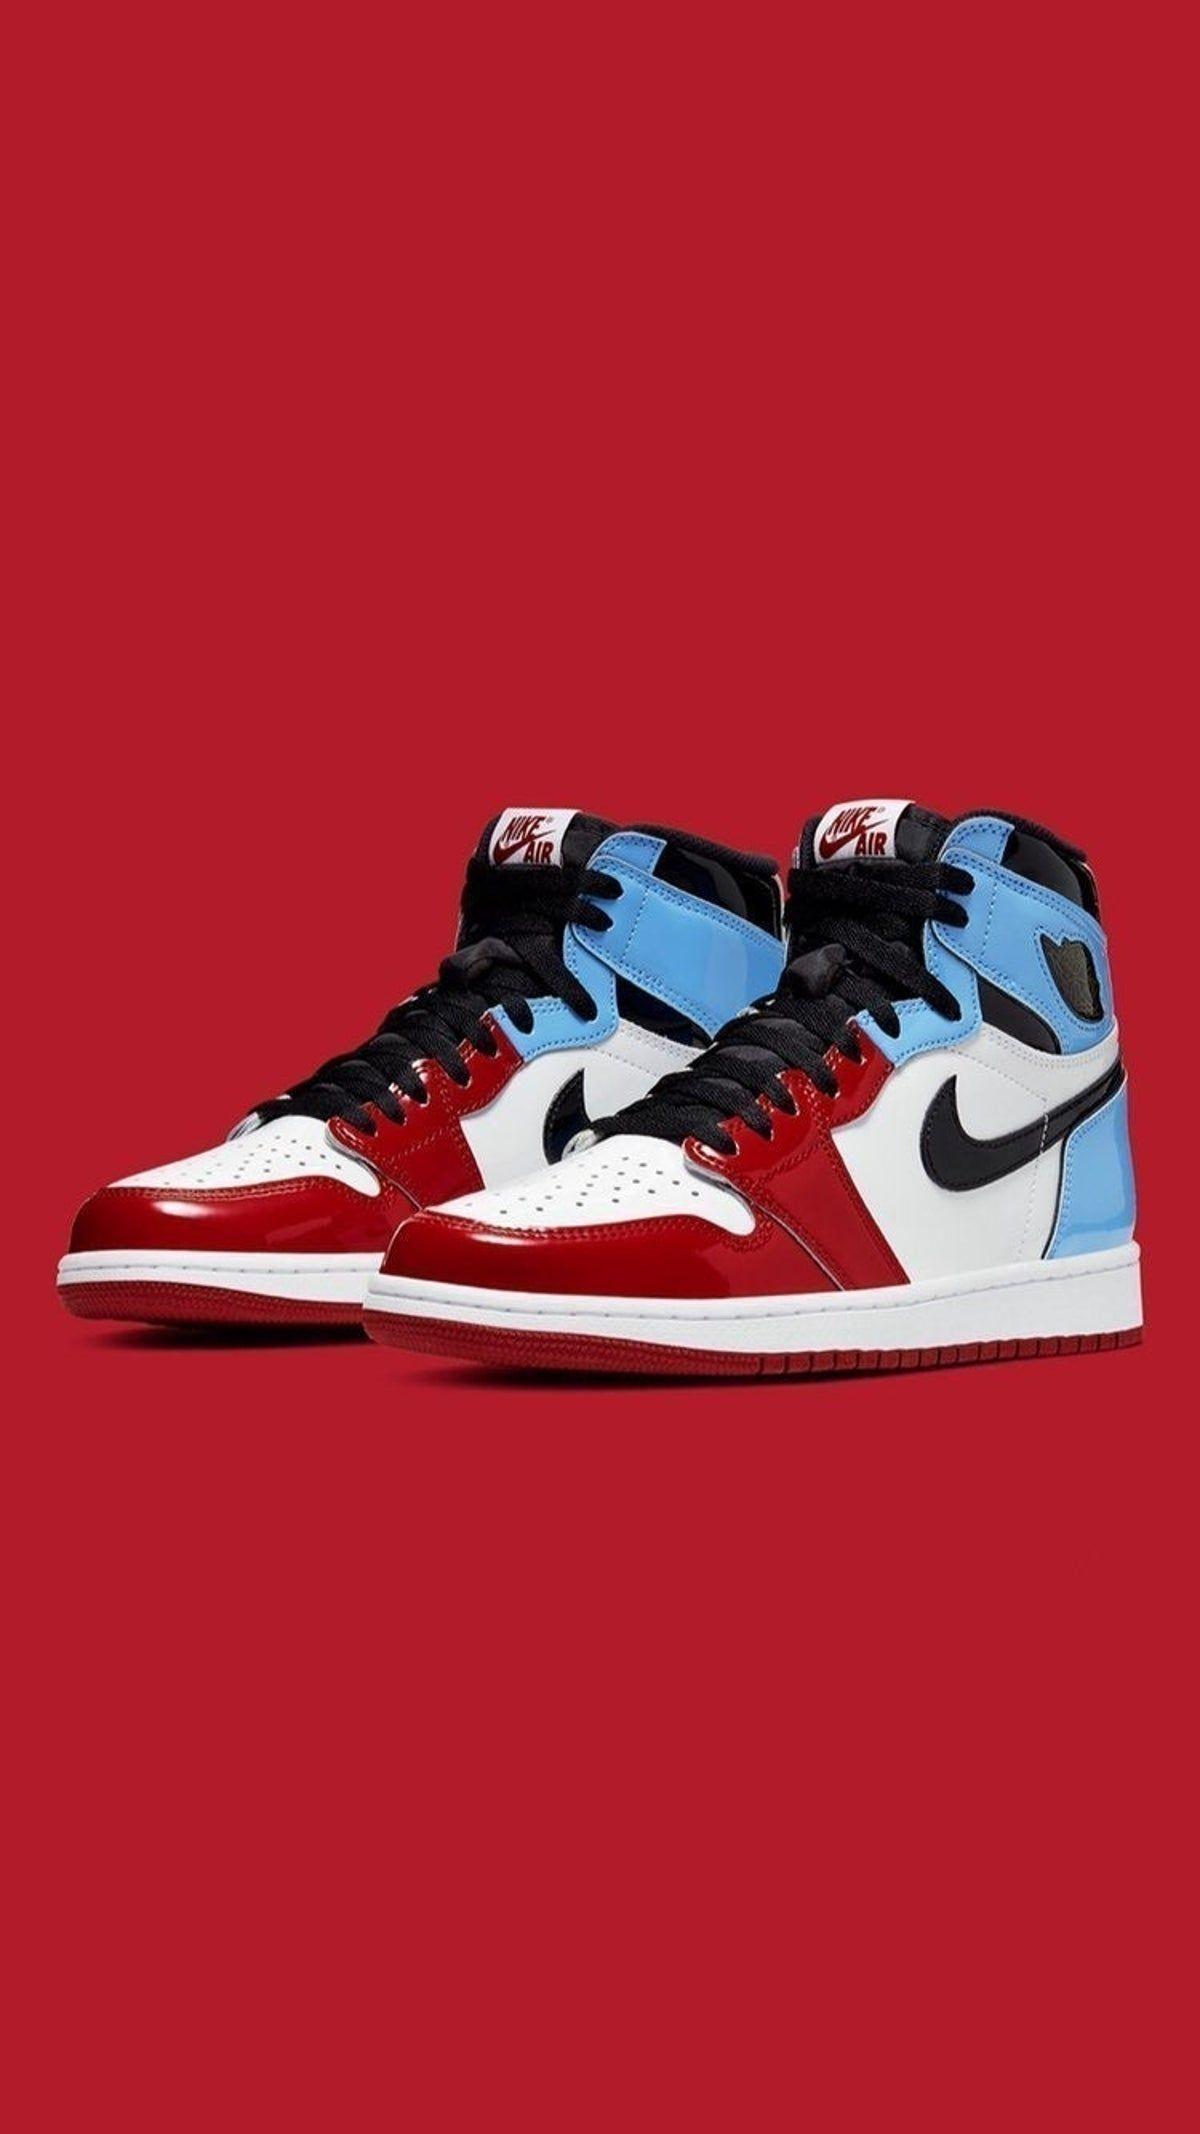 Air Jordan 1 High Fearless Unc Chicago Jordan Shoes Wallpaper Sneakers Wallpaper Jordan Shoes Retro